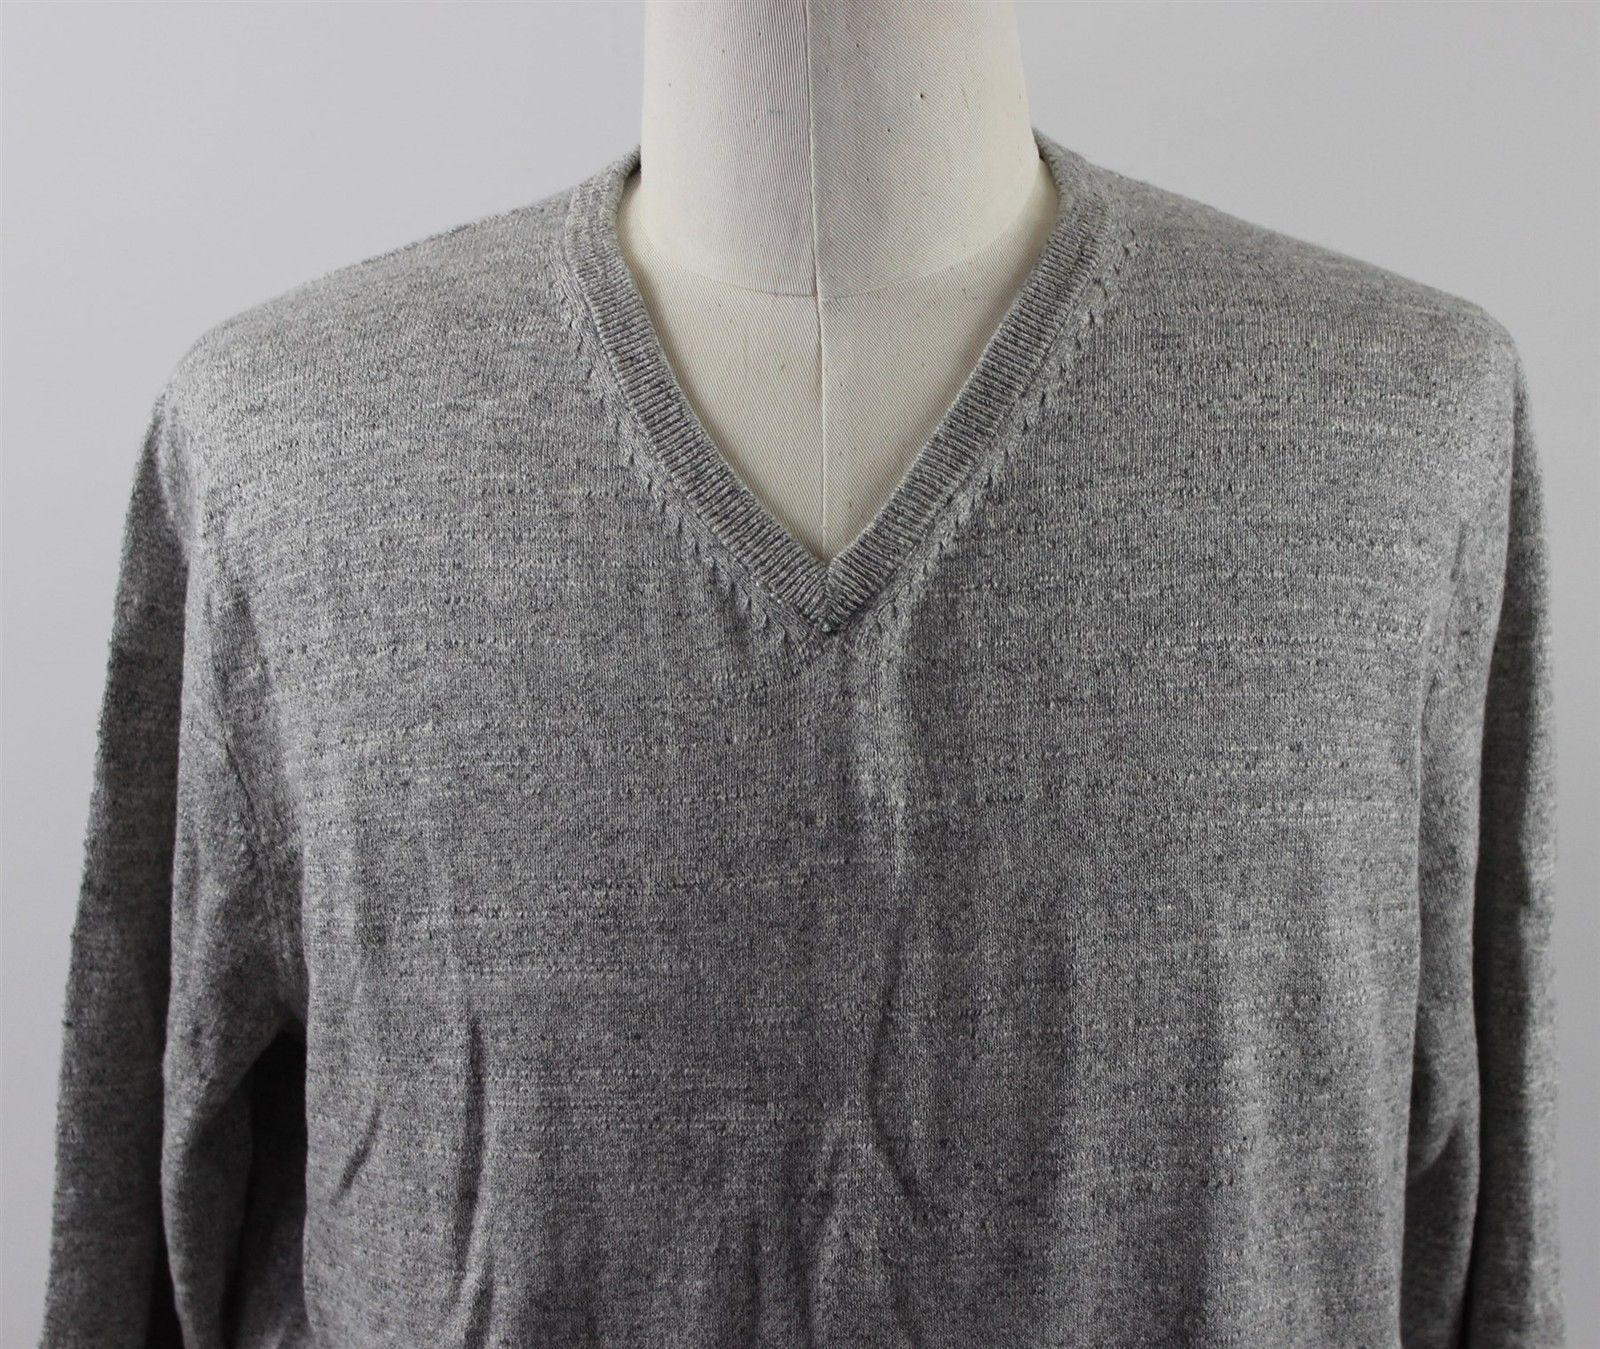 c78585716 NWT J.Crew Slim Rugged Cotton V-Neck Sweater MENS XL Heather Steel Fisherman